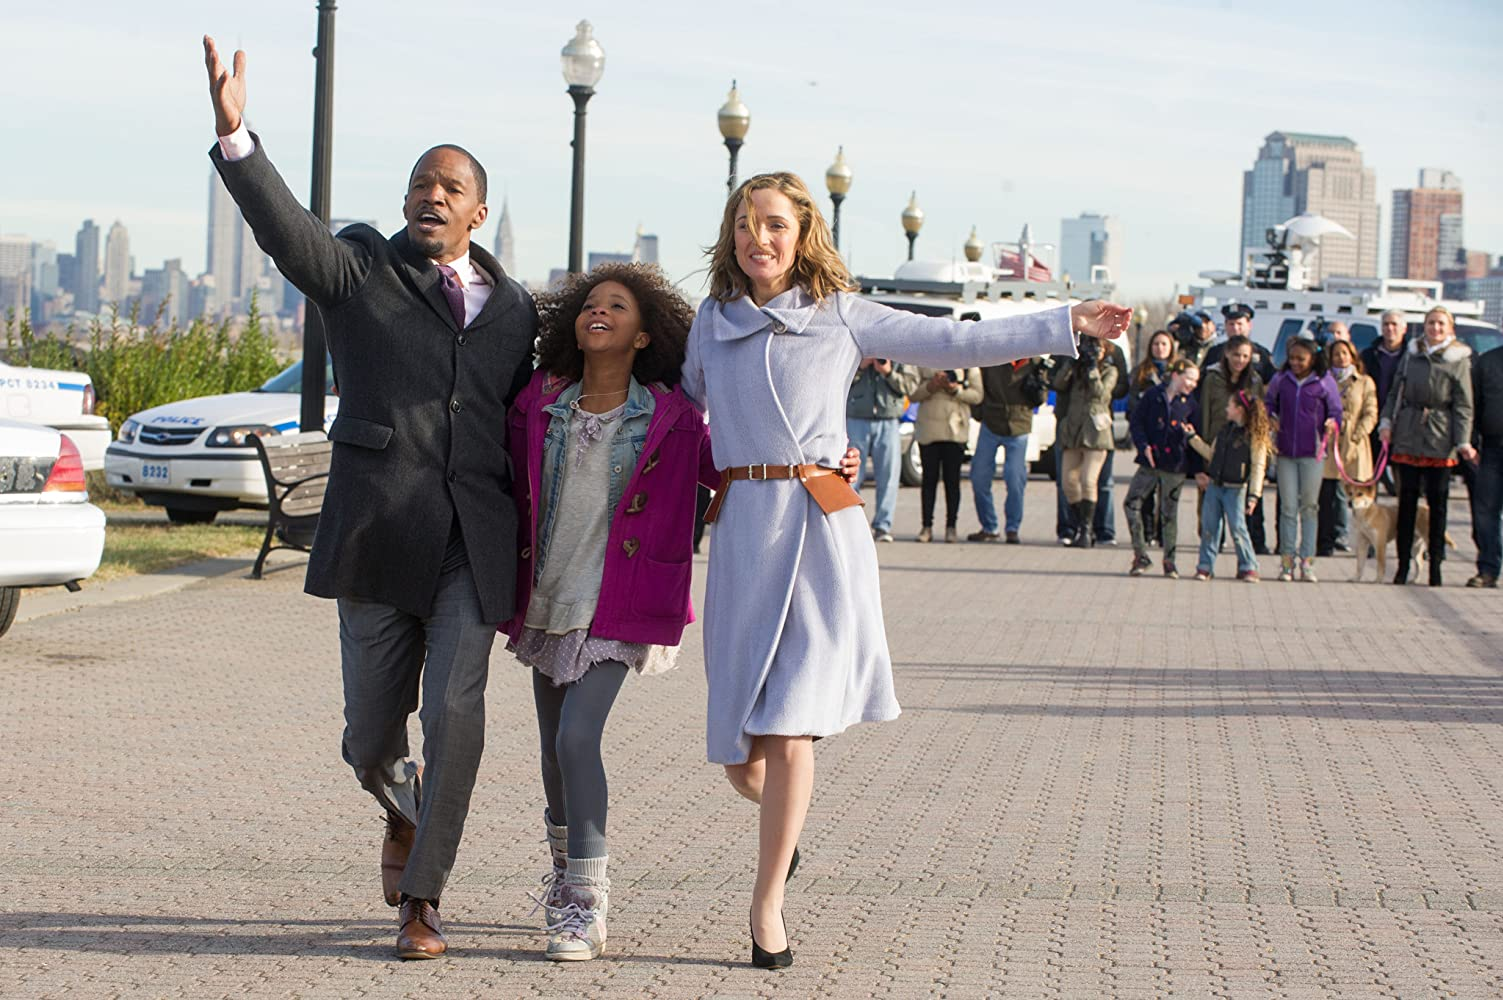 Jamie Foxx, Rose Byrne, and Quvenzhané Wallis in Annie (2014)